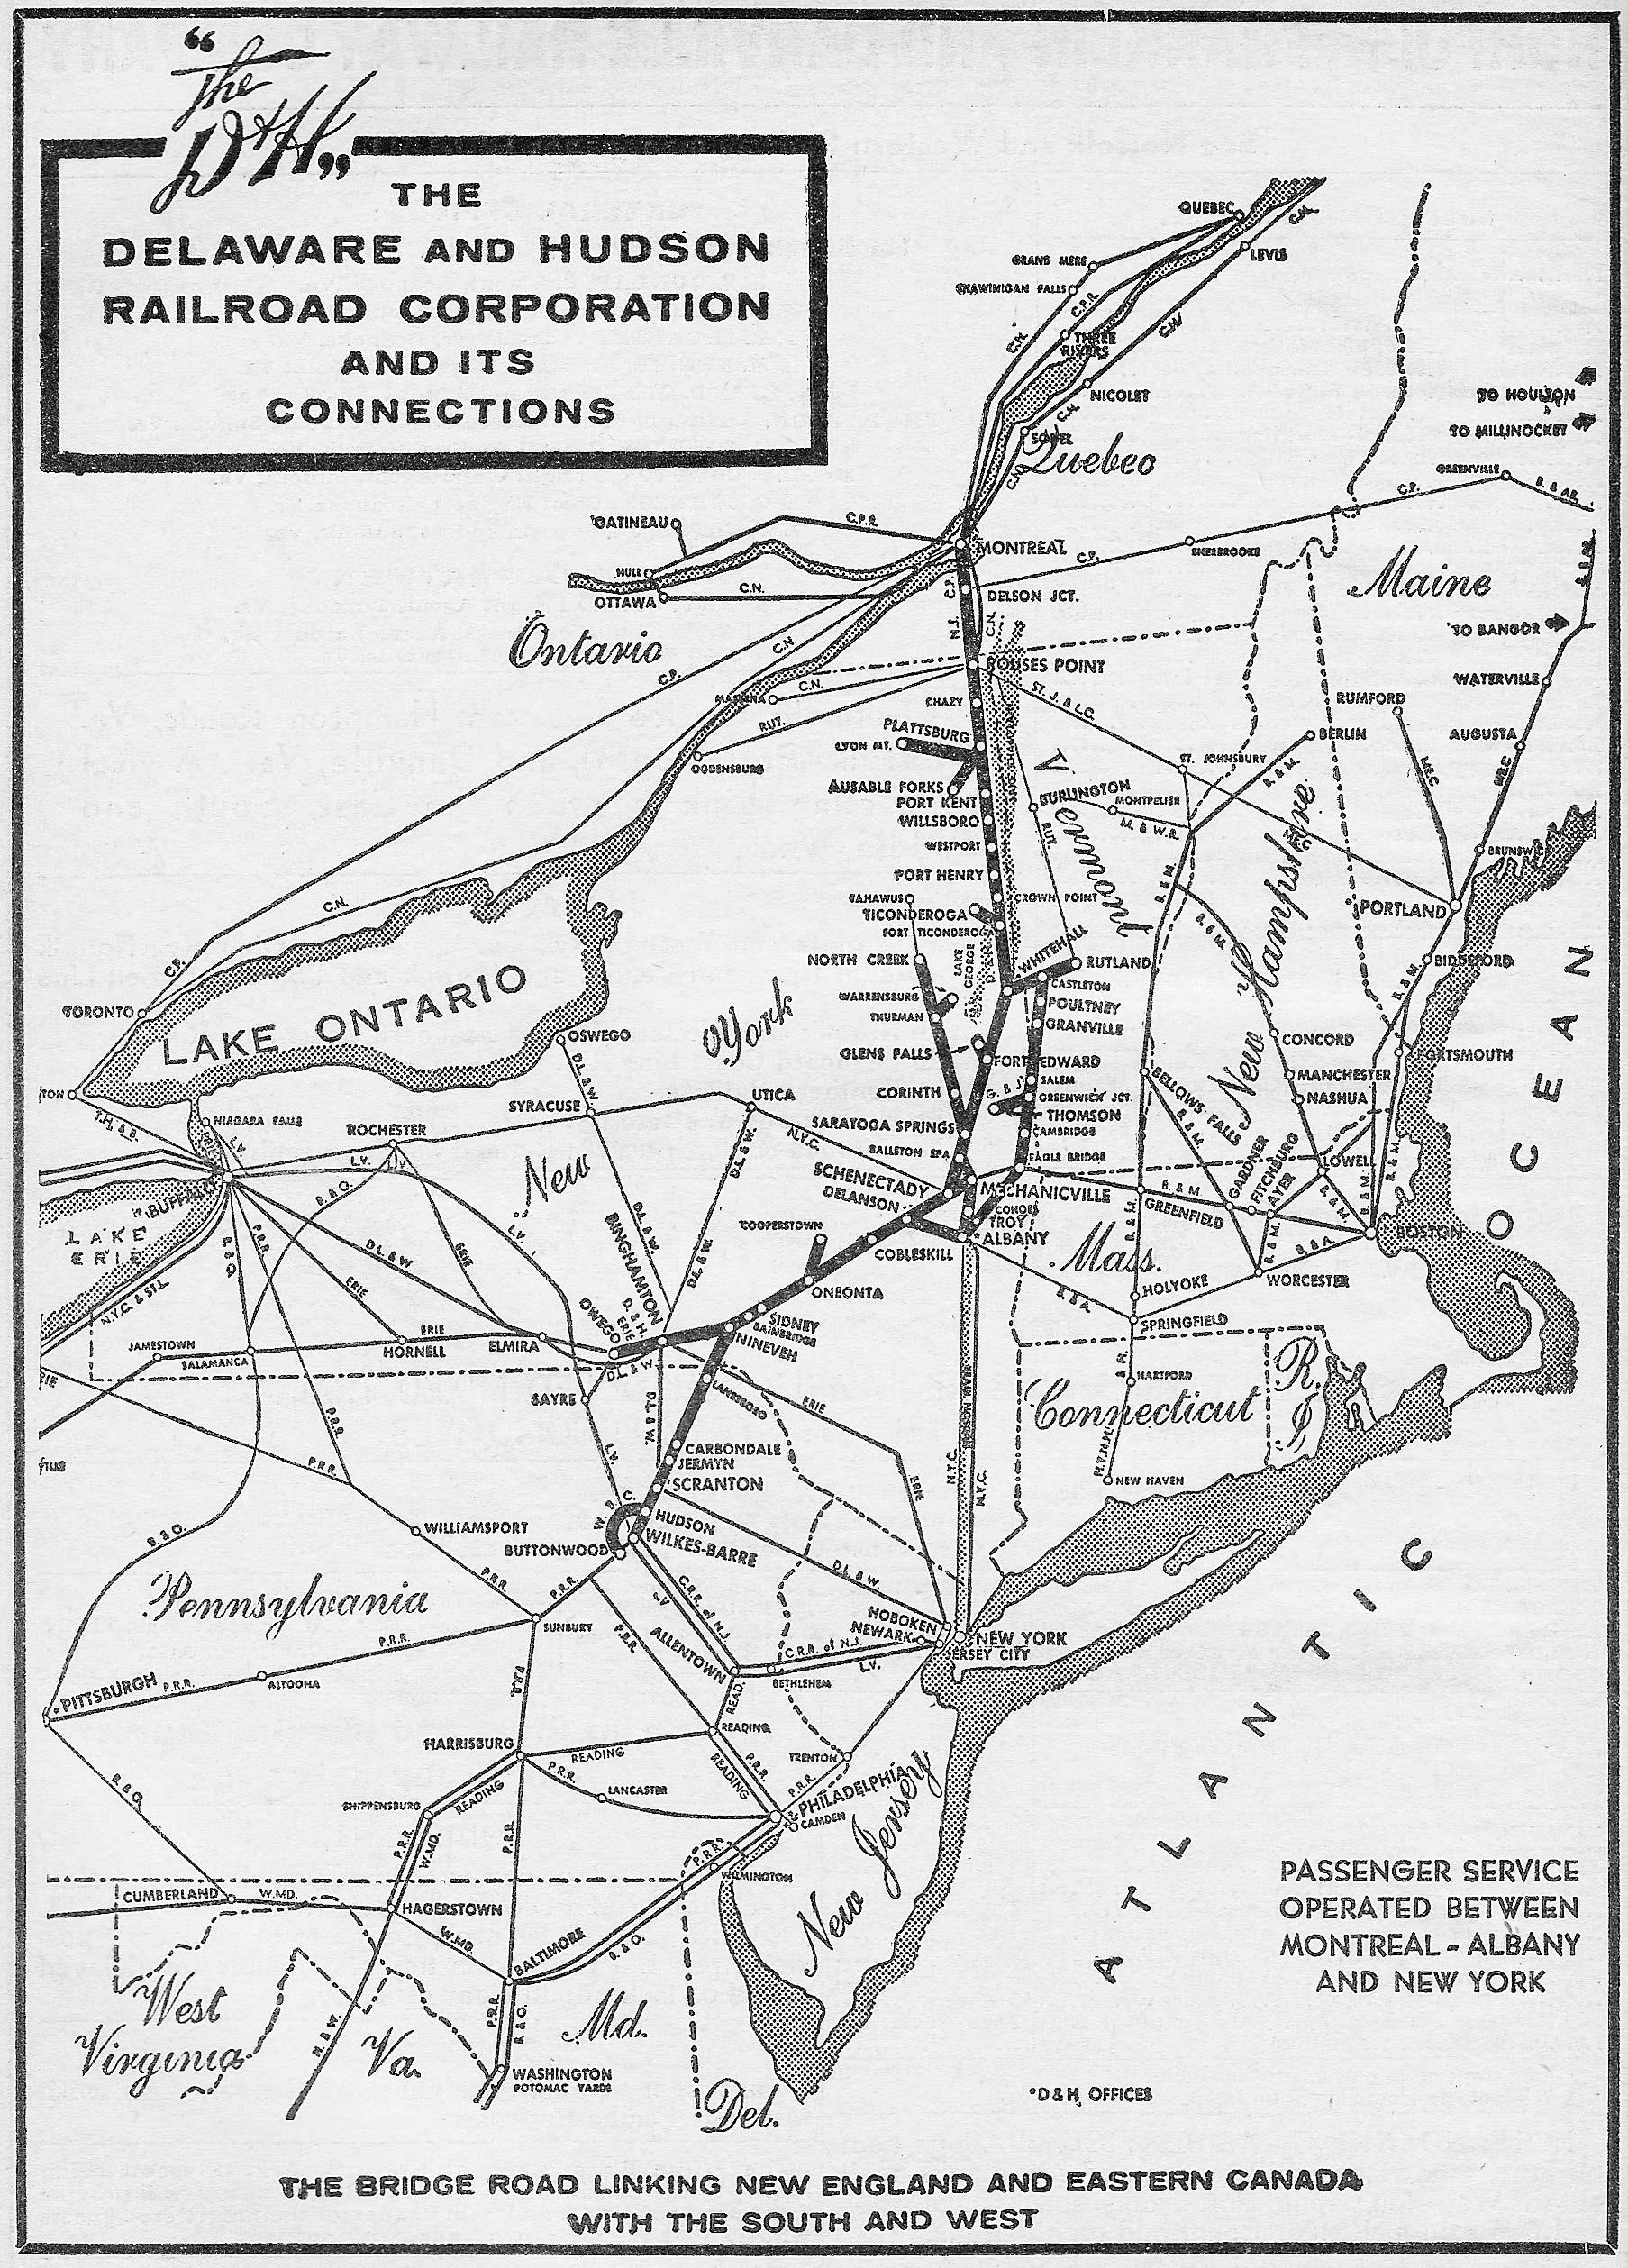 Transportation Company - Delaware & Hudson - Railroad